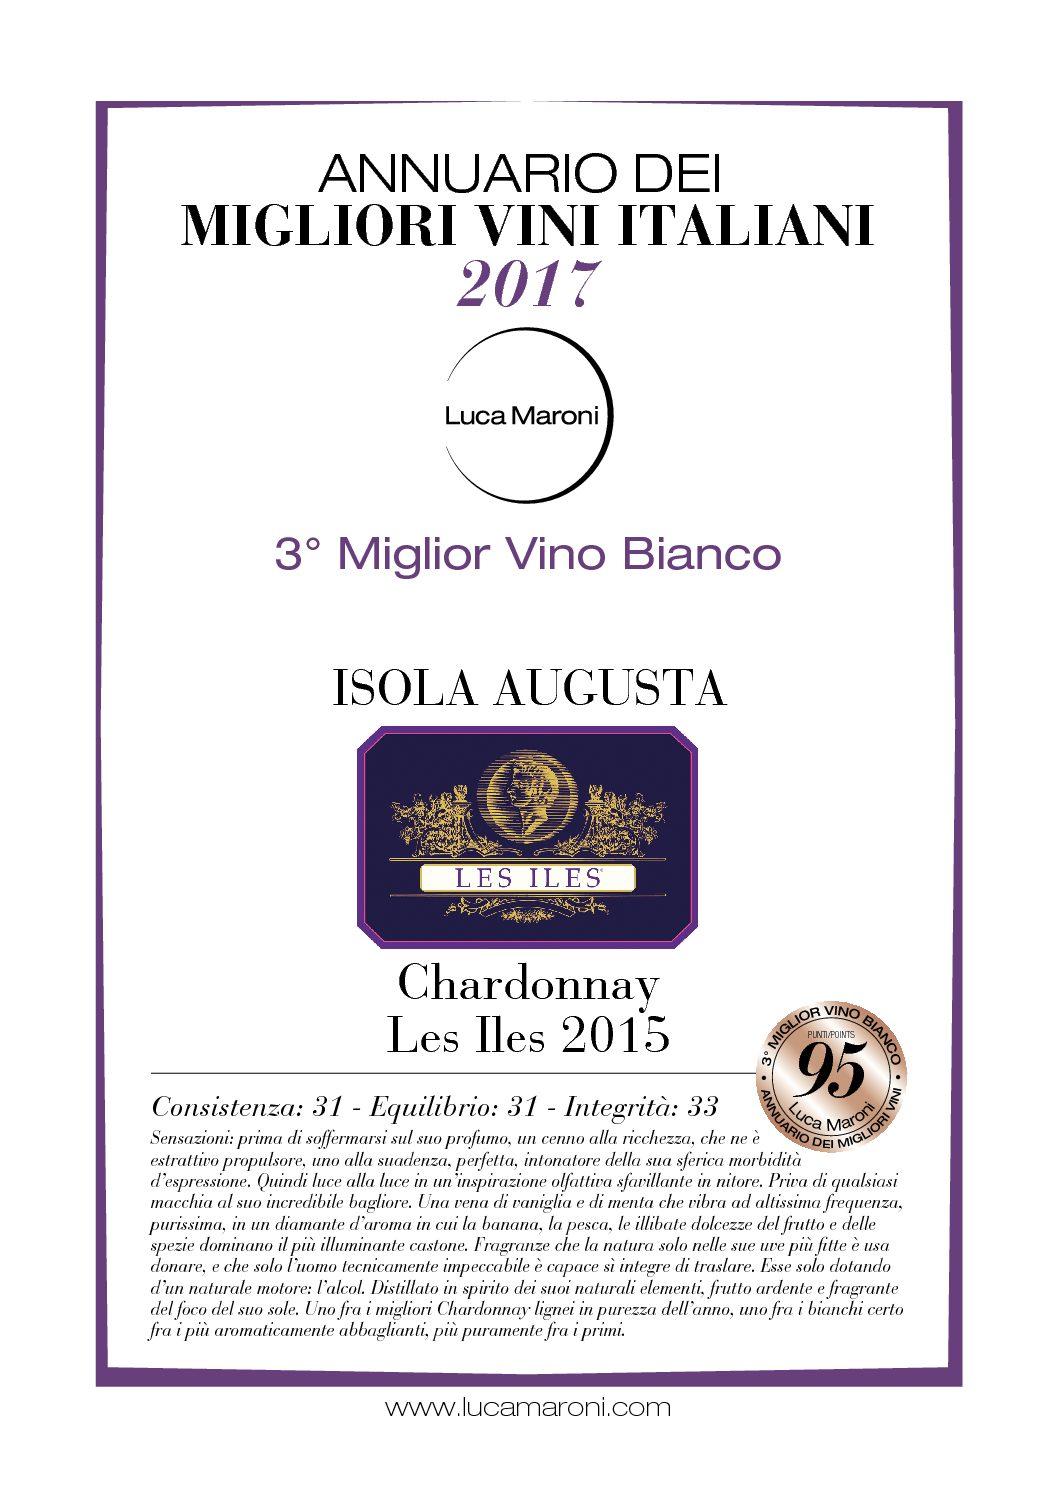 Les Iles Chardonnay  - 3rd Best Italian White Wine